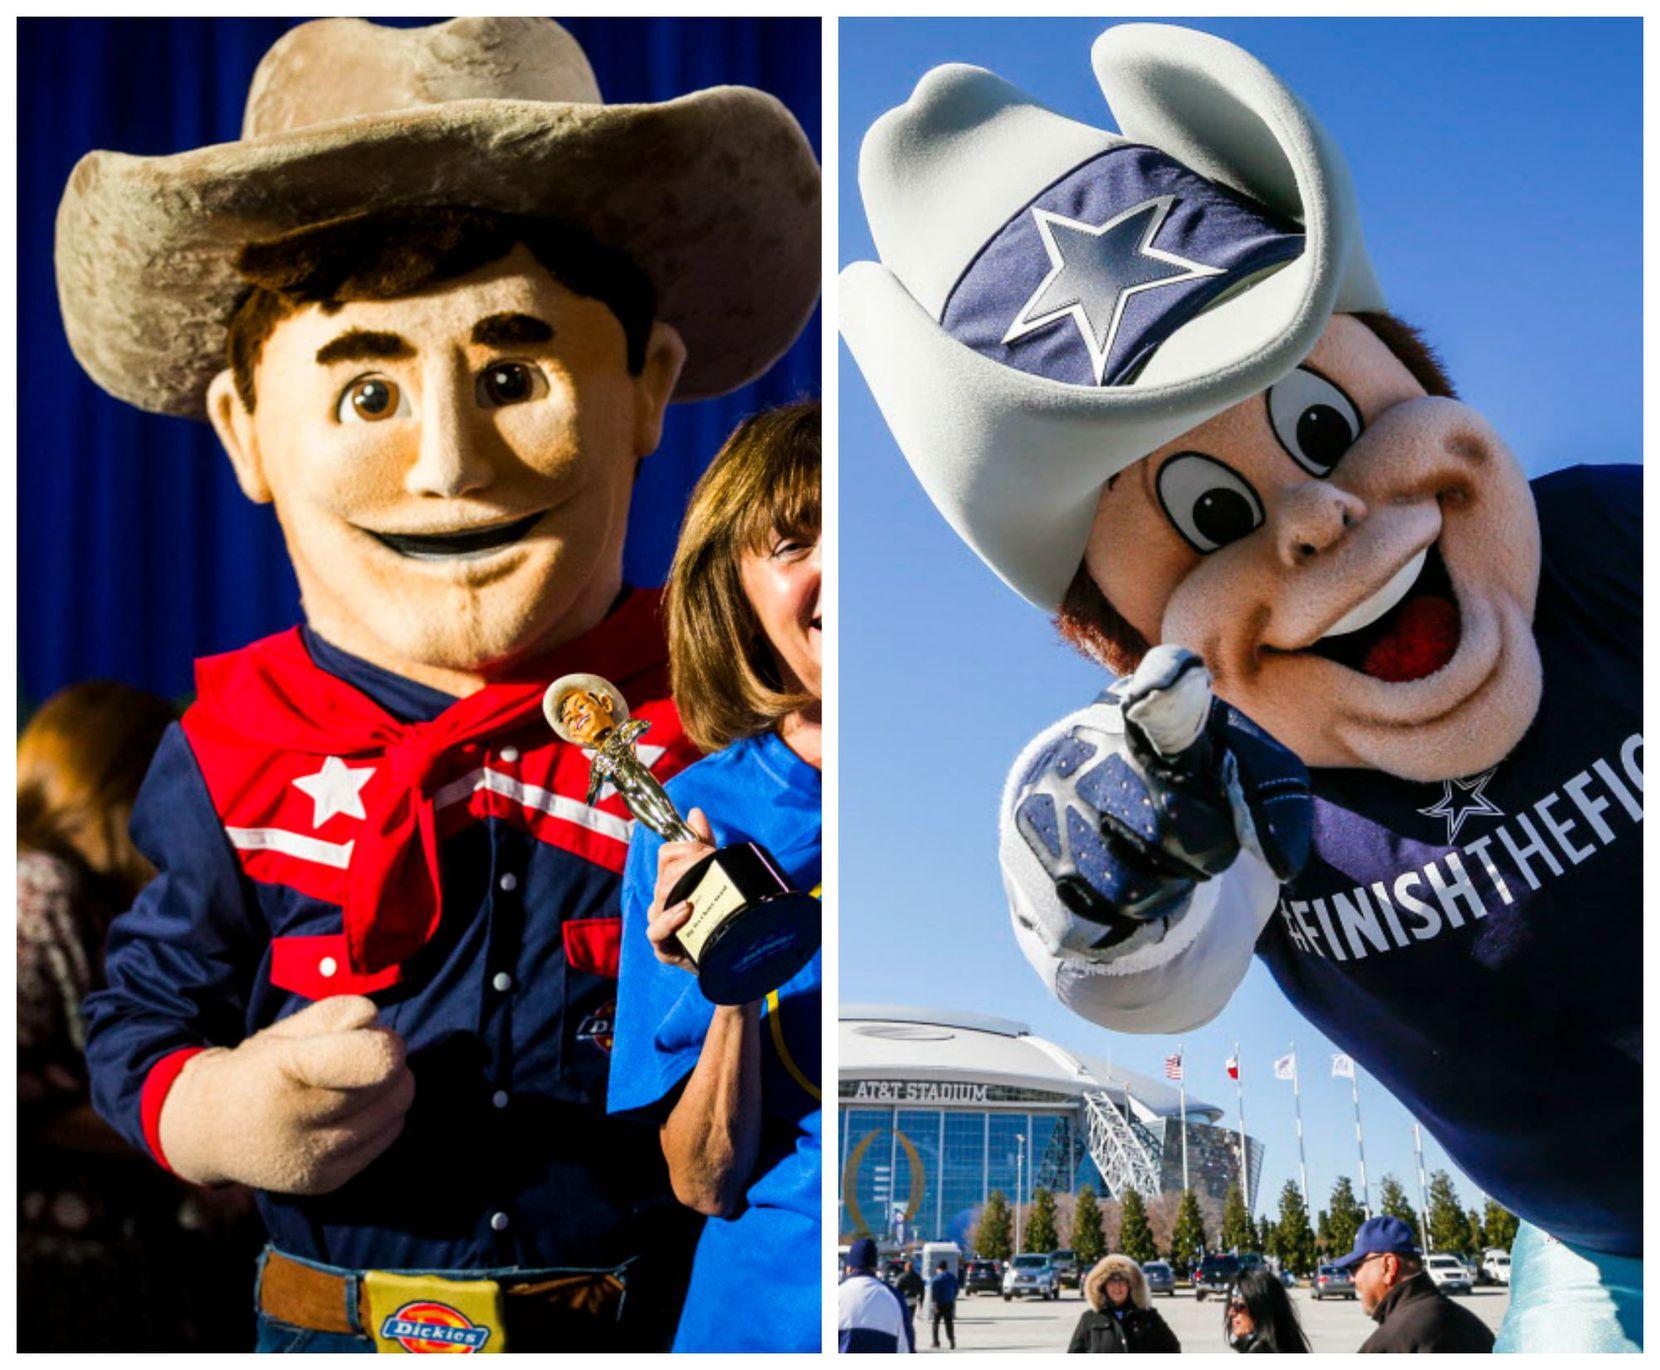 Left: Big Tex, or maybe Dallas Cowboys mascot Rowdy? Right: Rowdy... We think. Maybe Big Tex?